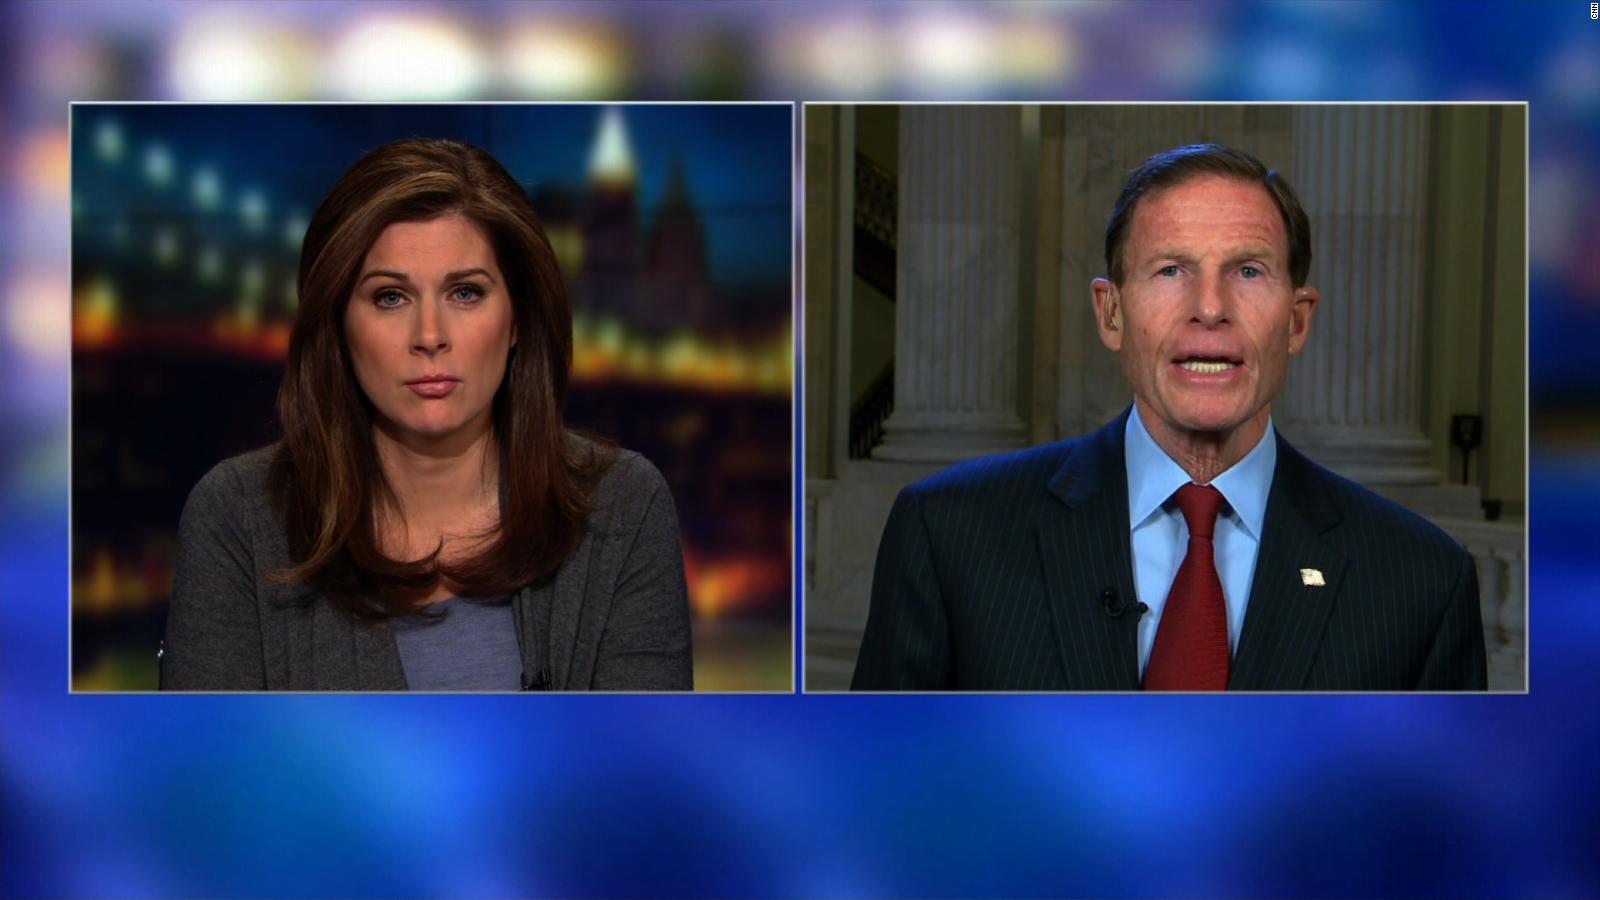 Democrats say Trump associate may have misled House panel over Seychelles  meeting - CNNPolitics